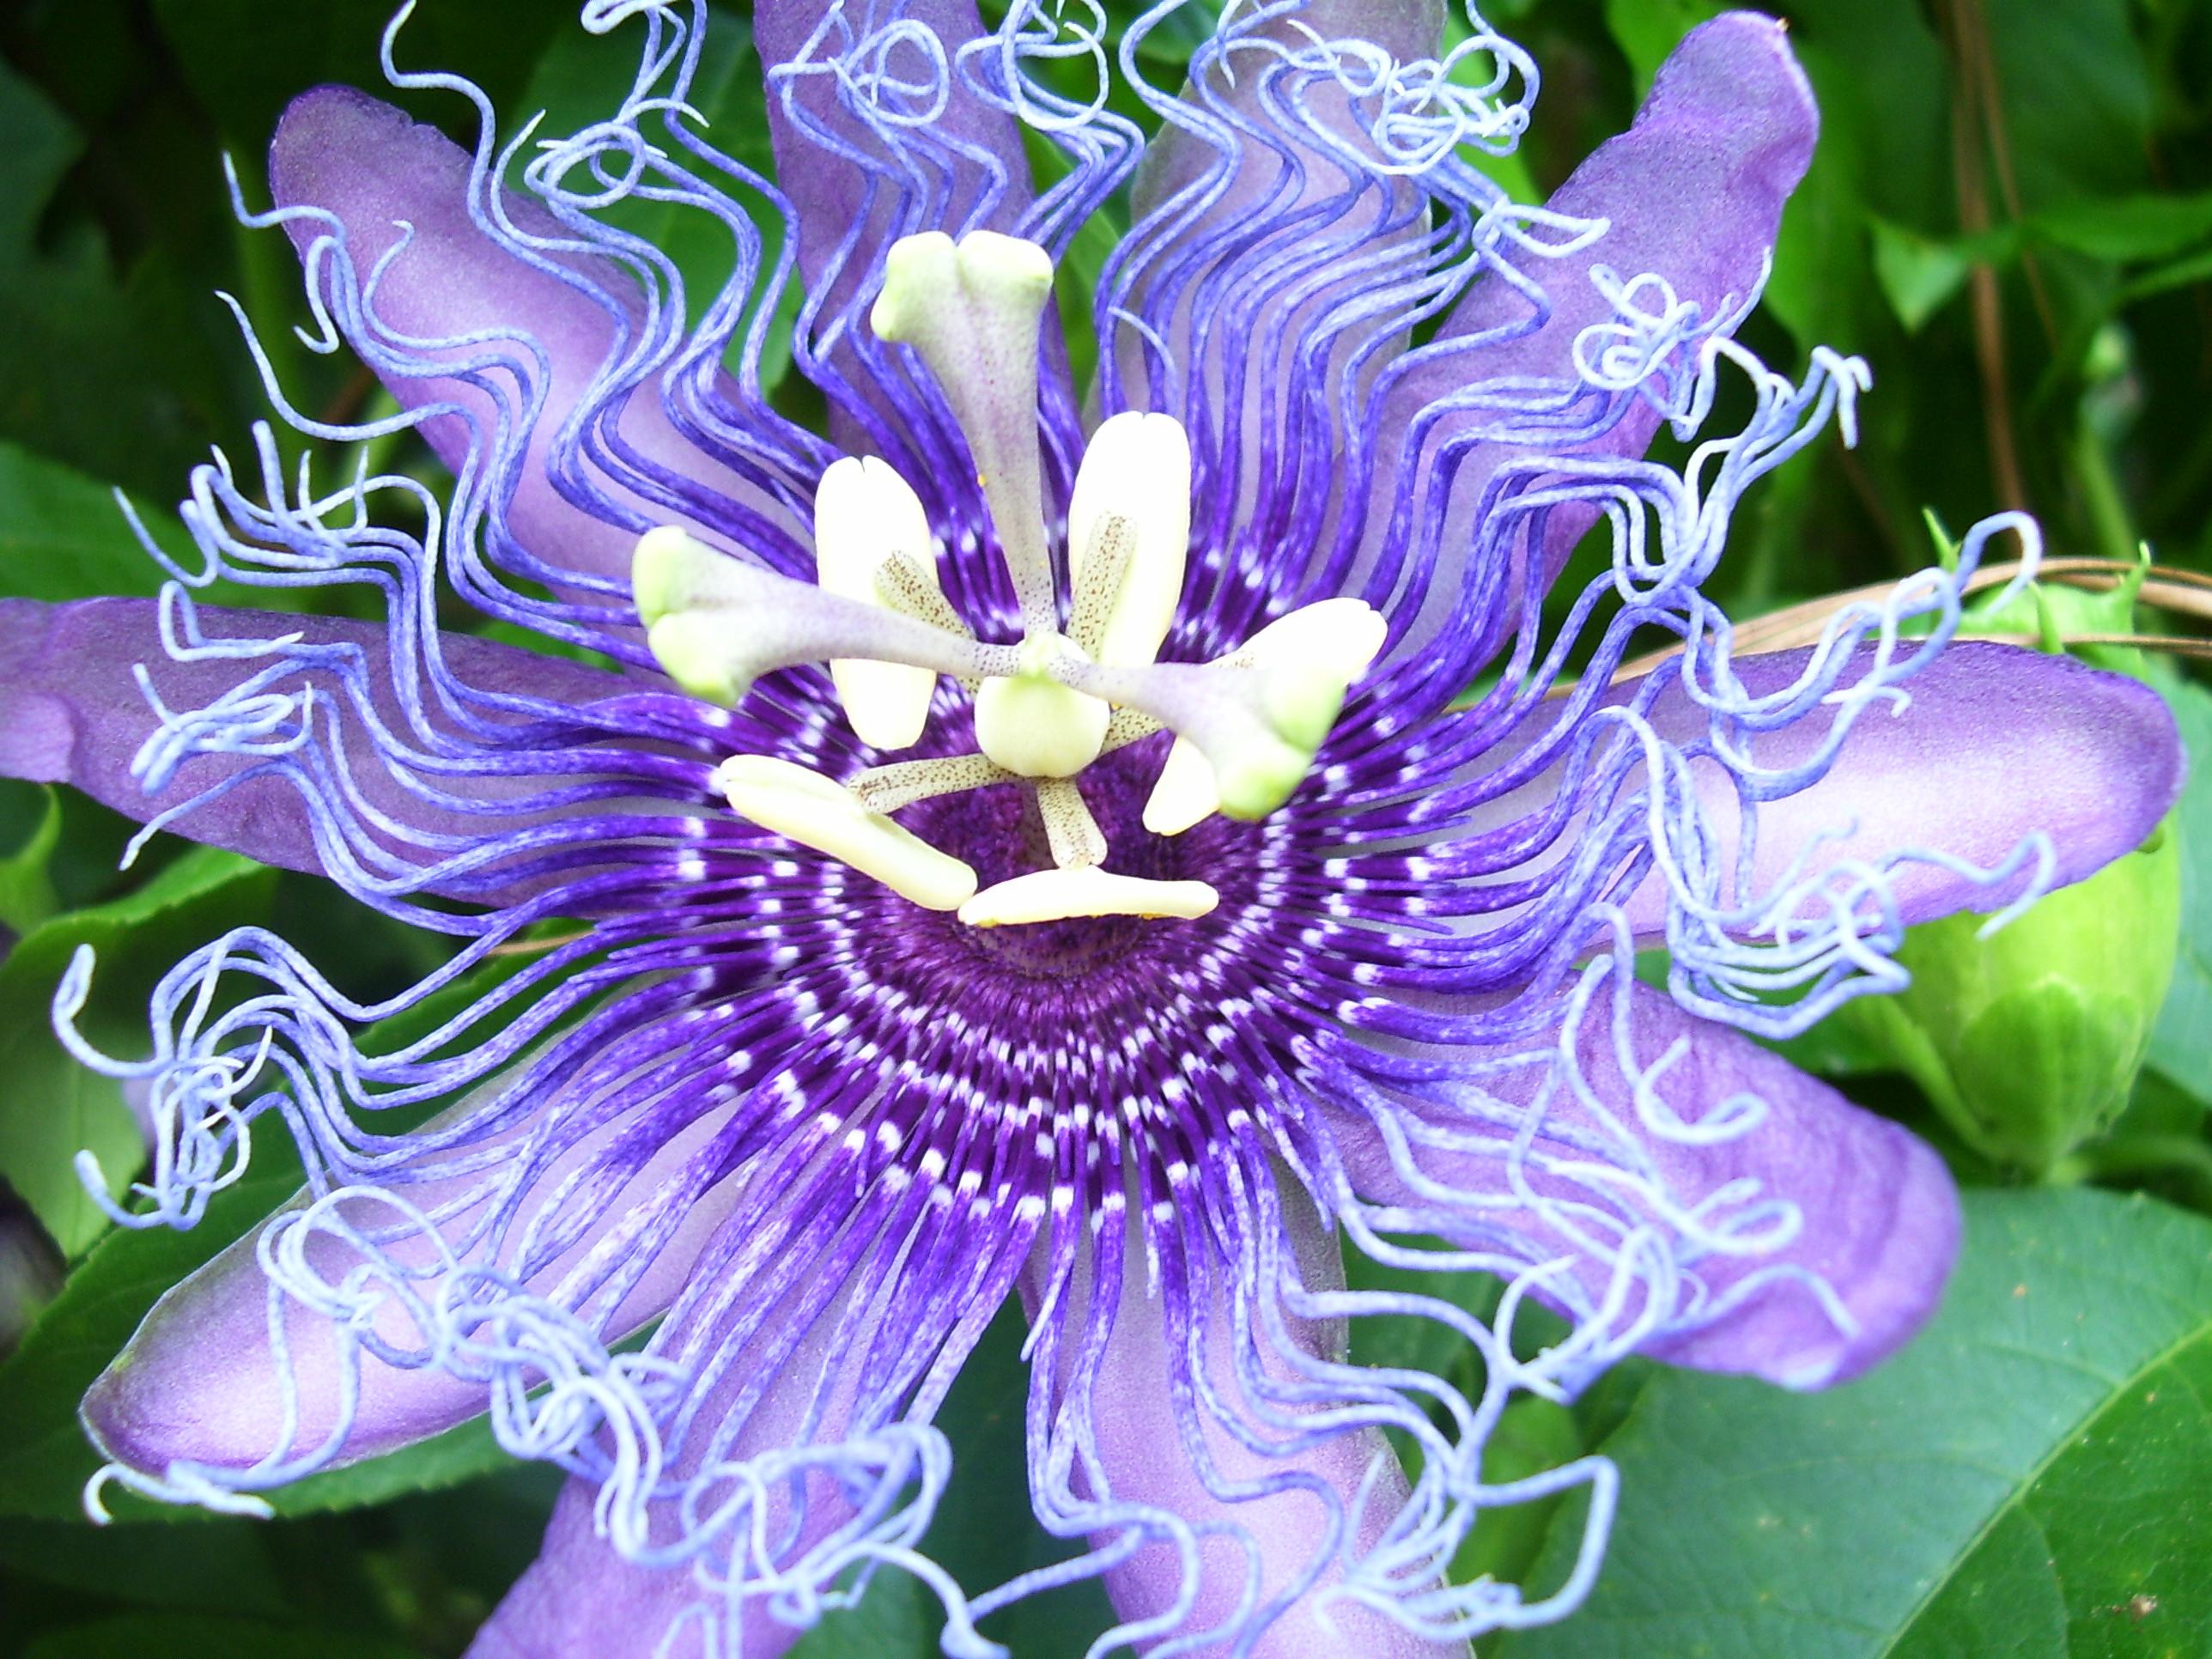 crazy flower by wolfpilot on deviantart